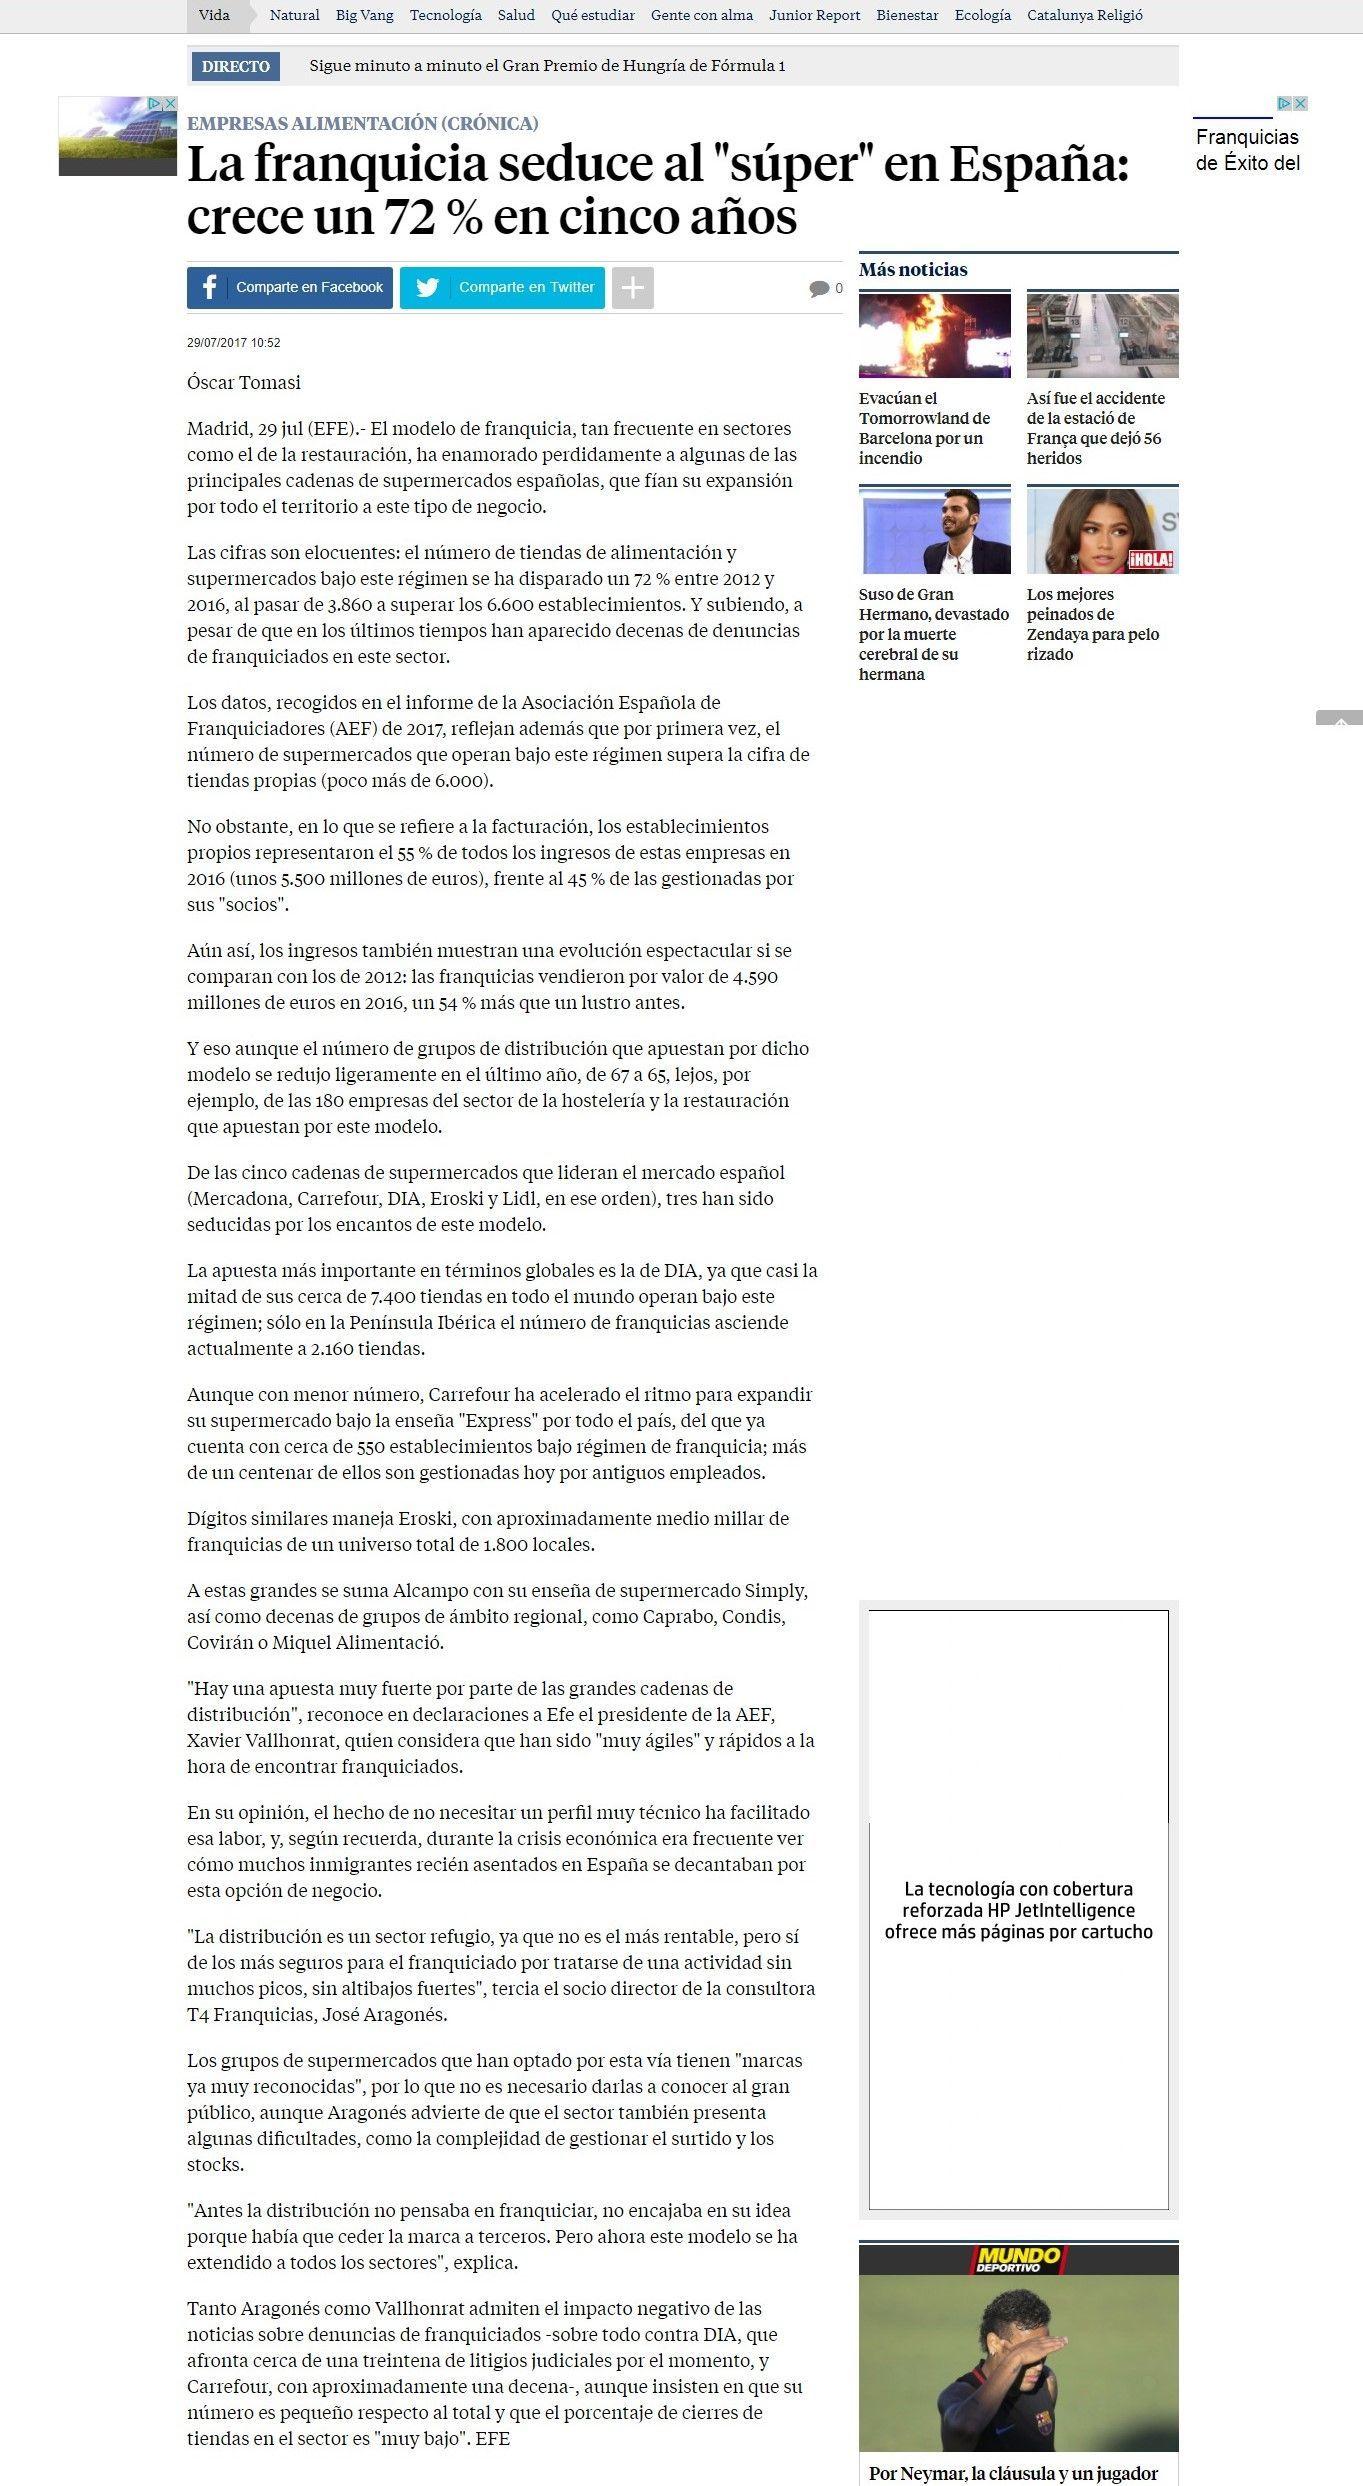 https://whiterabbit.es/wp-content/uploads/2017/07/Entrevista-EFE-Agro_Web_La-Vanguardia-1.jpg